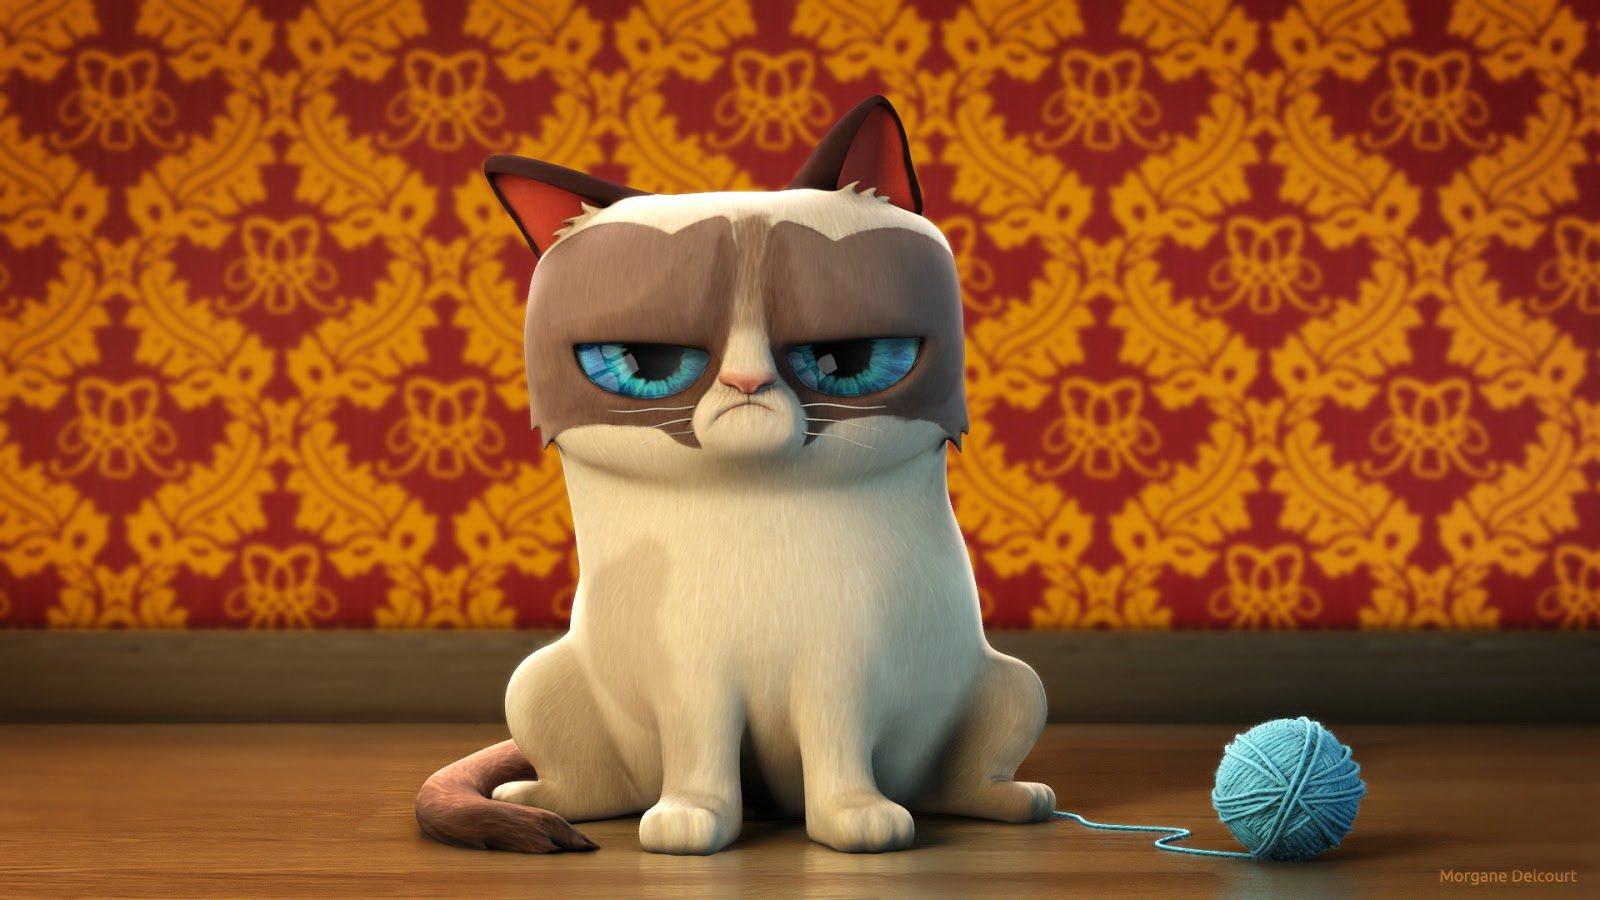 Cat meme quote funny humor grumpy 112 wallpaper 1600x900 355195 1600x900